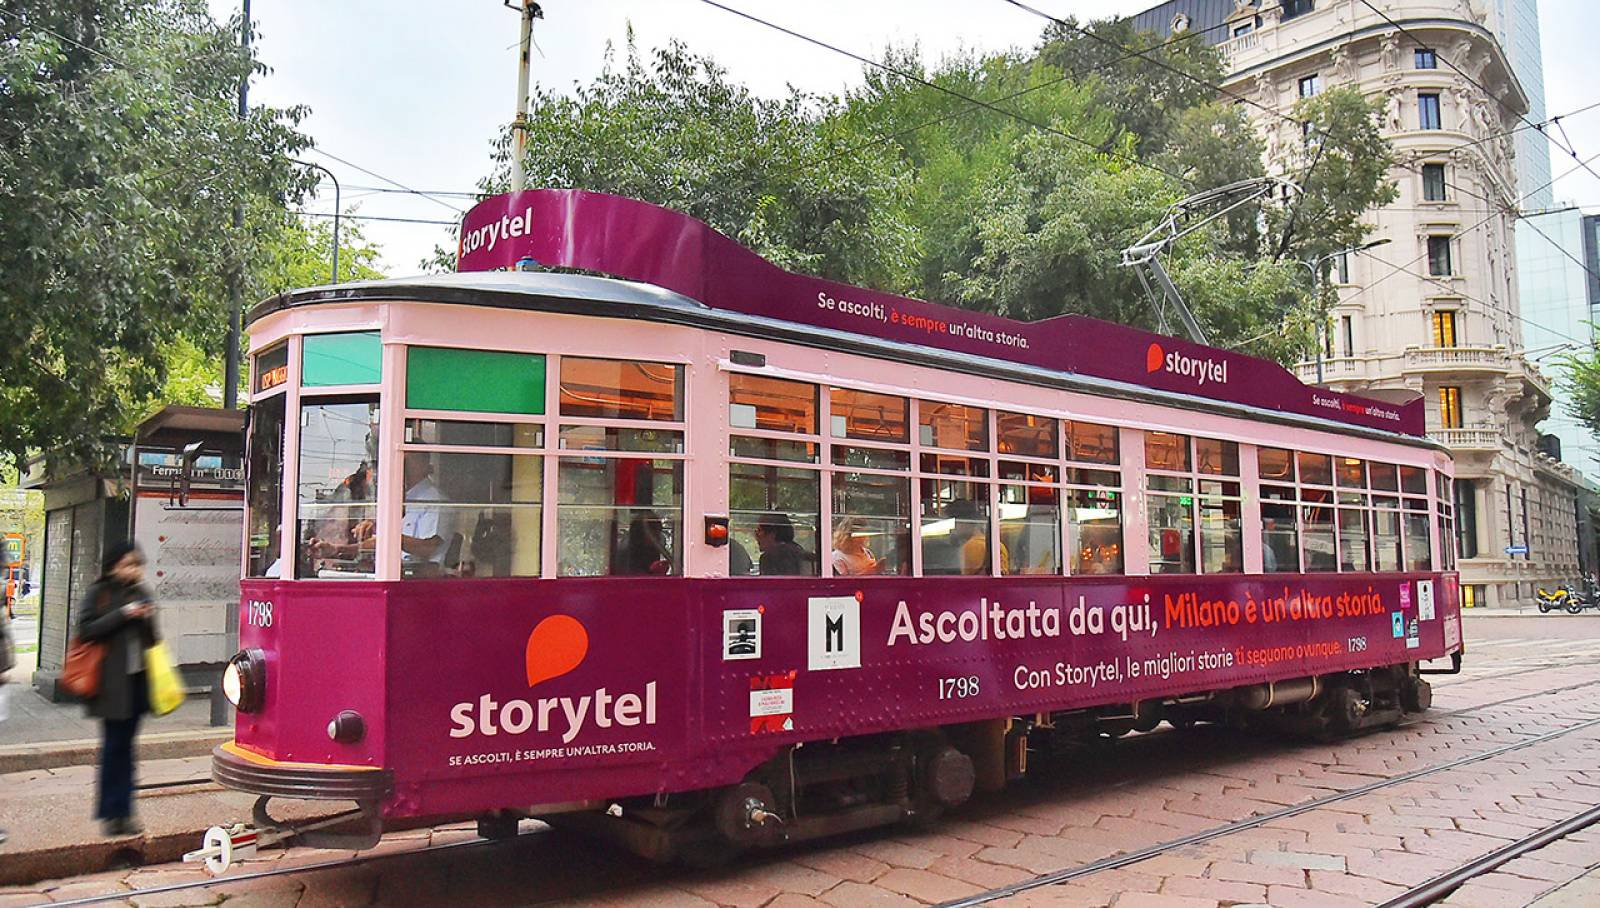 IGPDecaux OOH Advertising in Milan Full-Wrap for Storytel